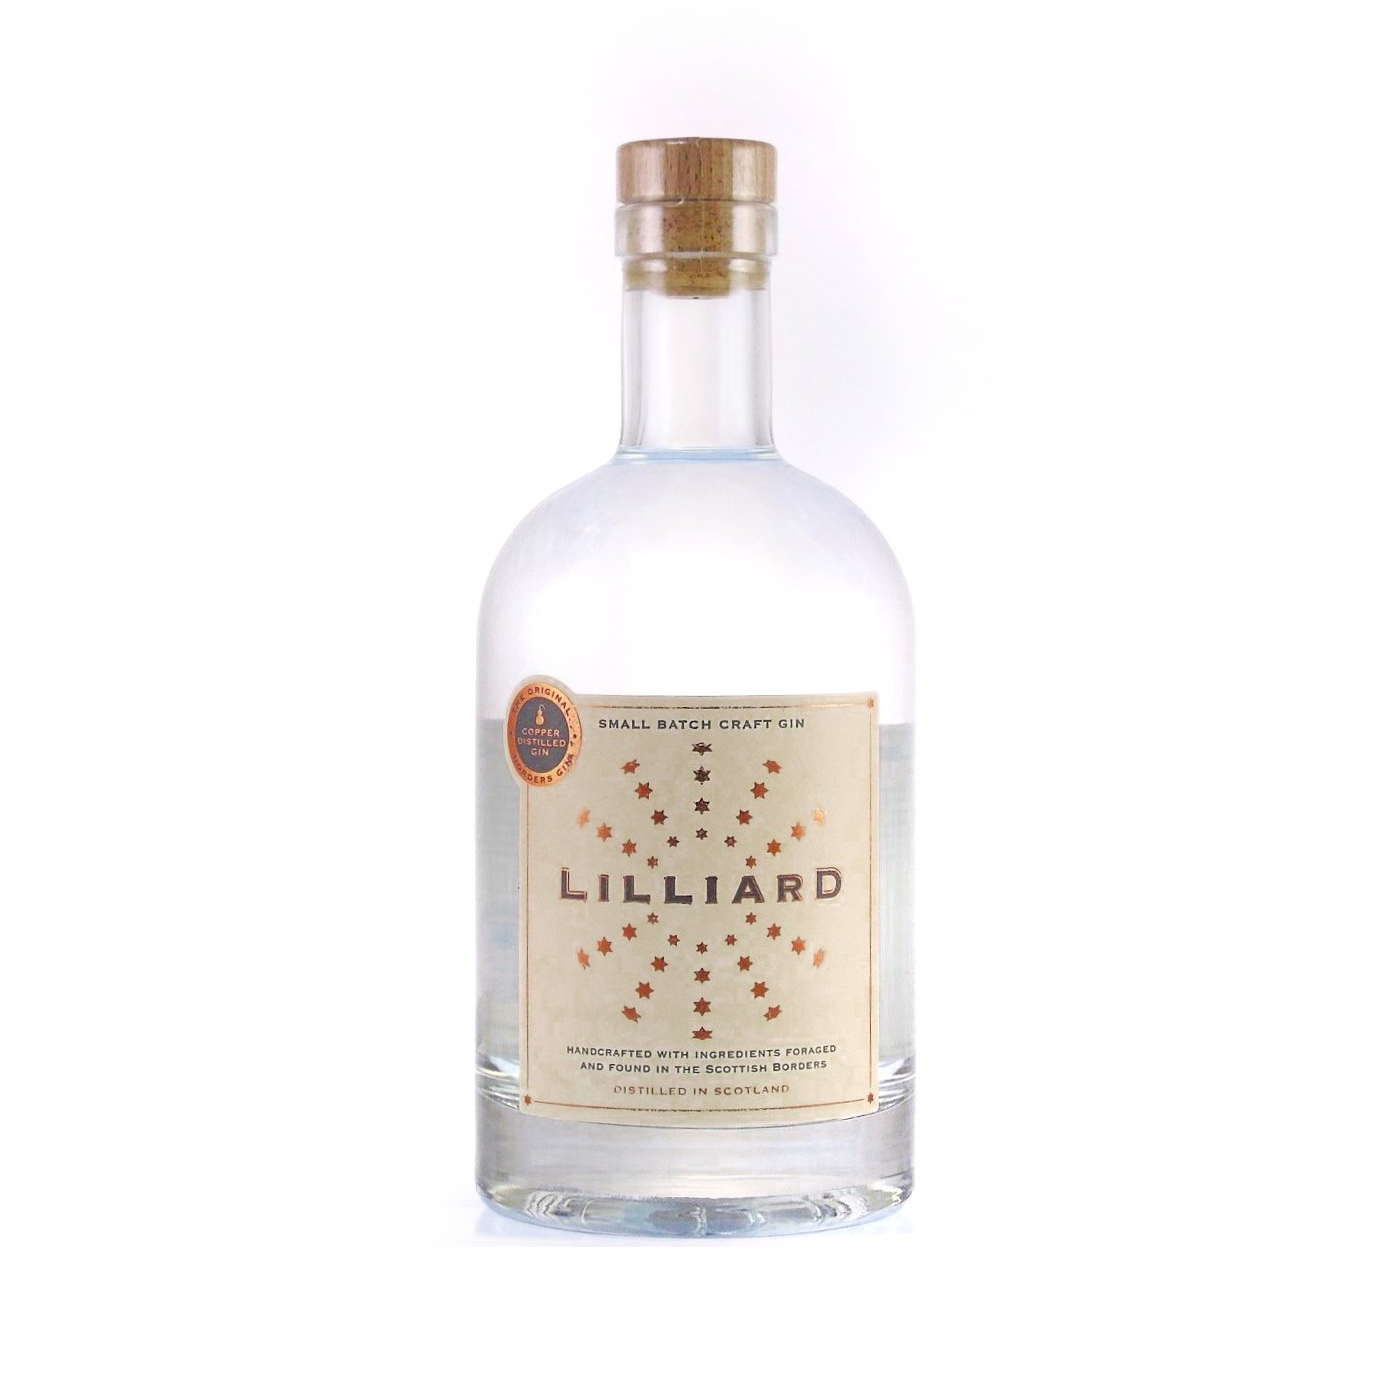 Lilliard Gin, £32